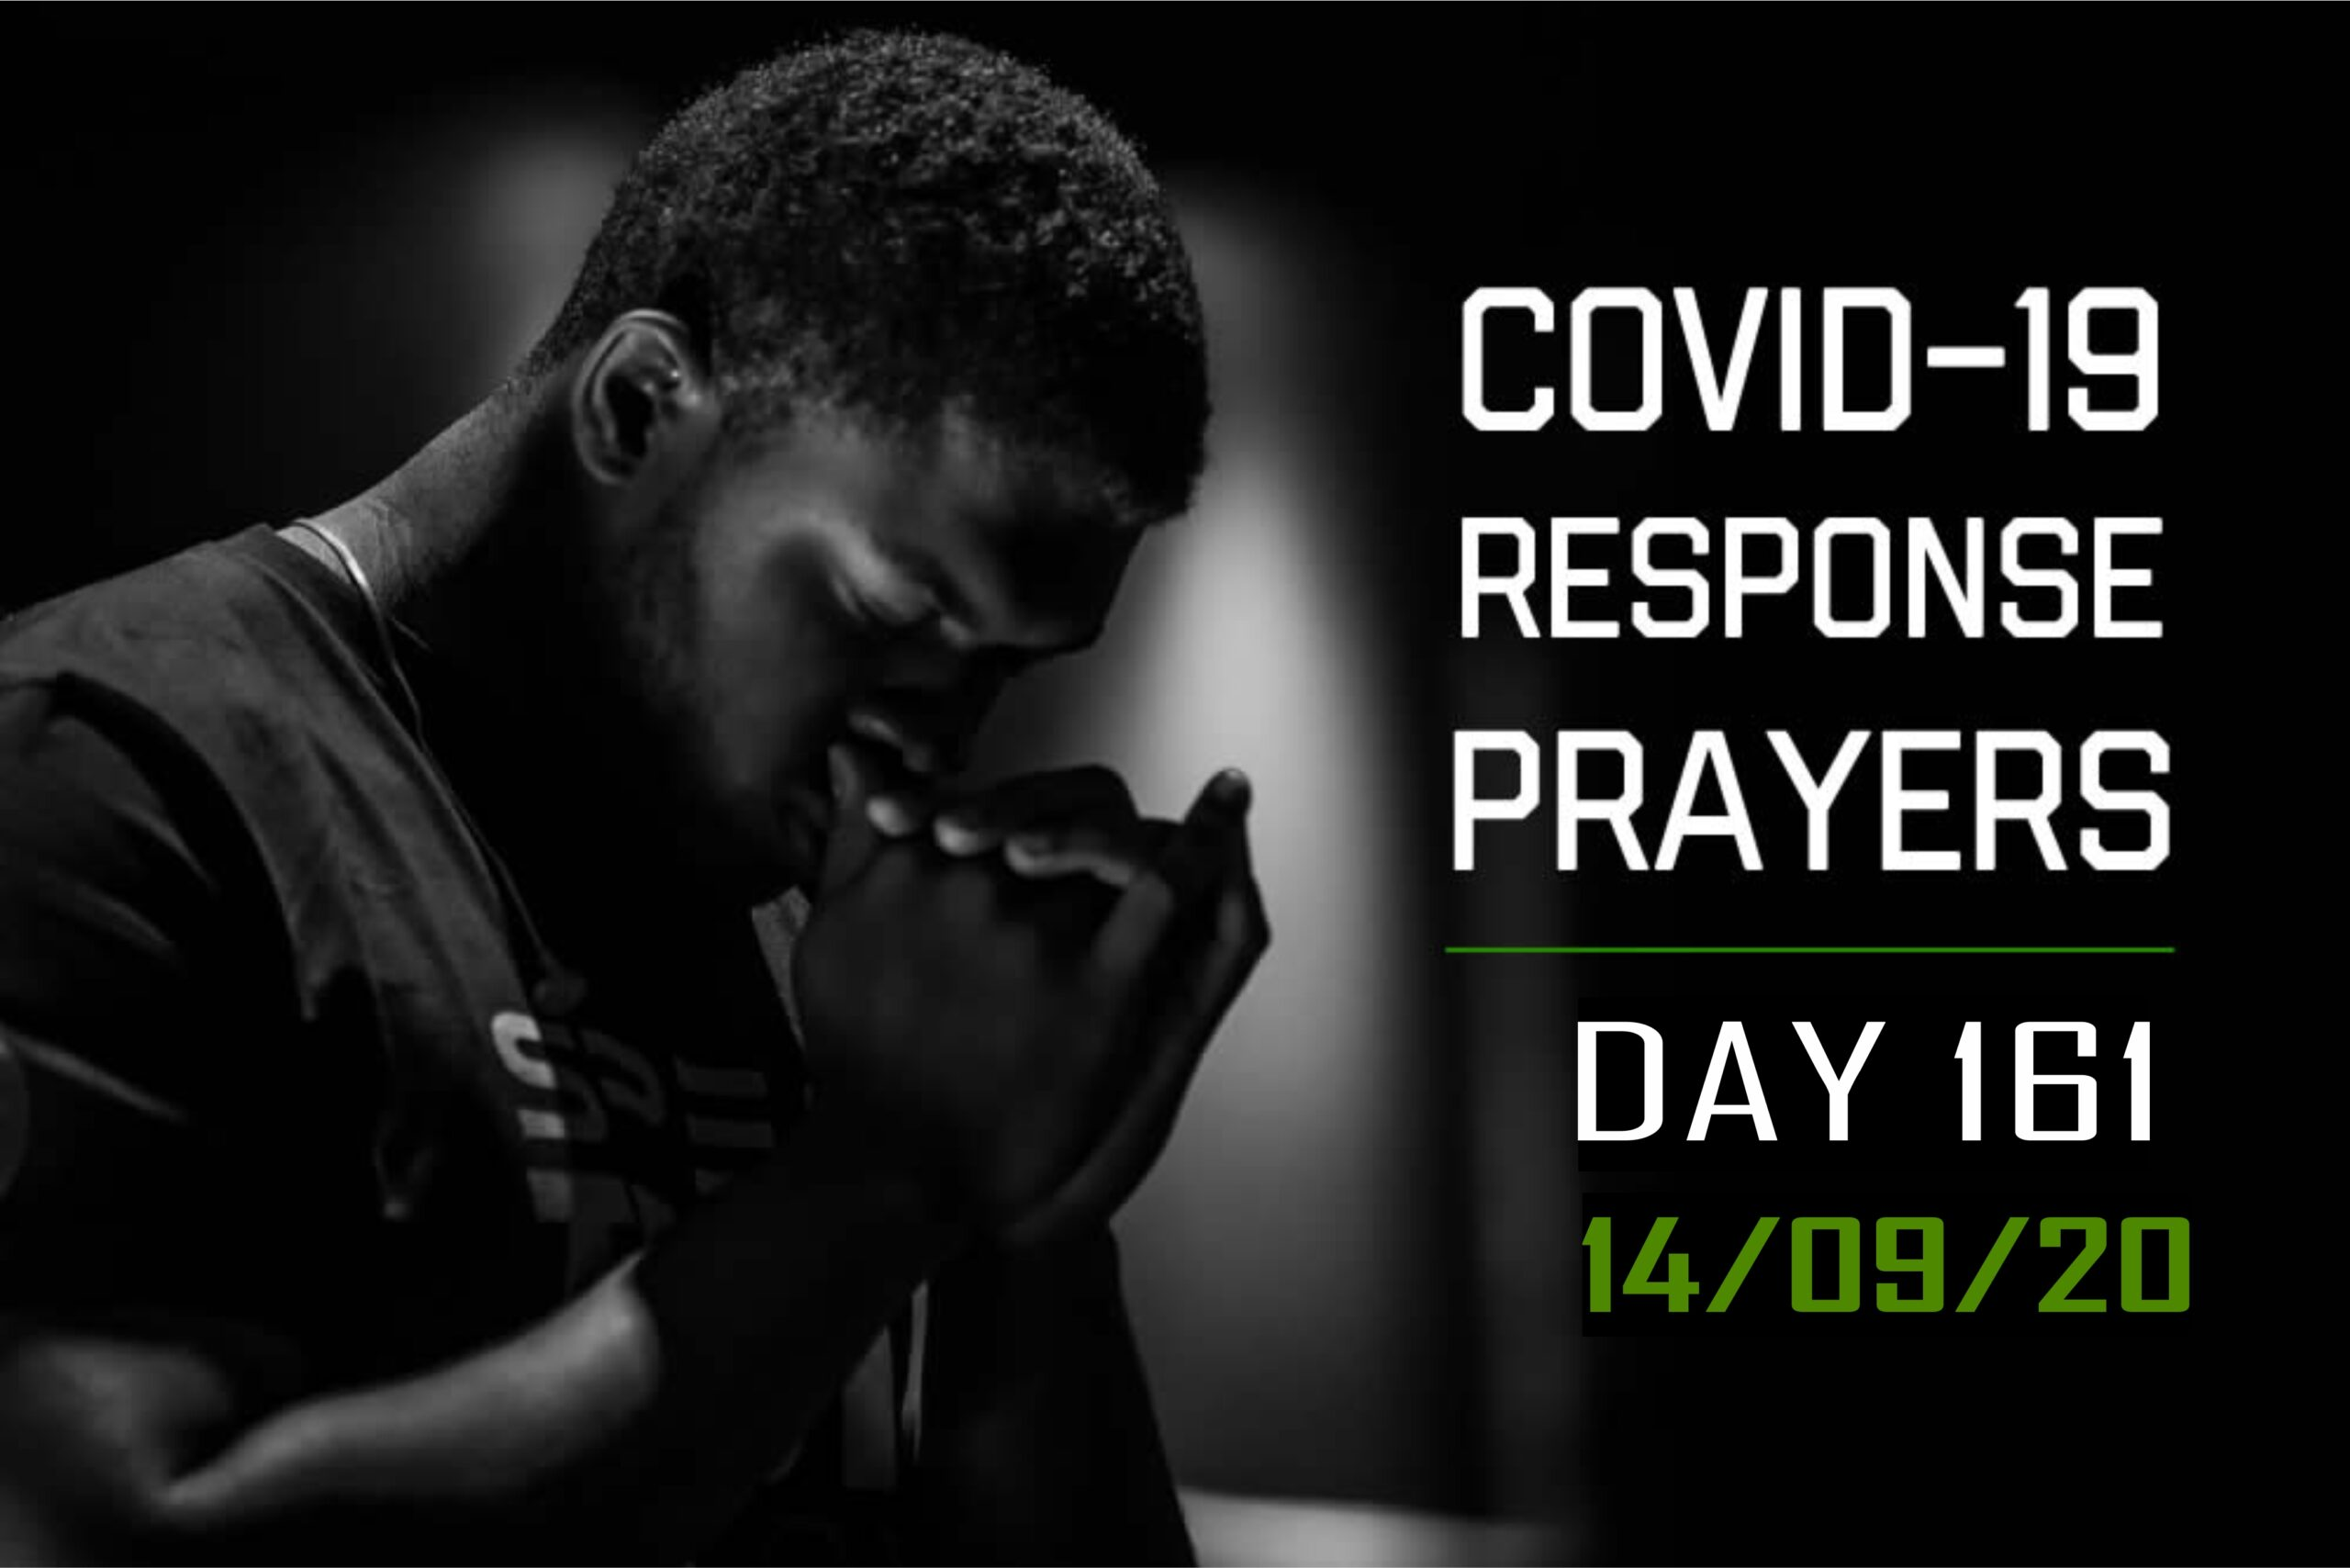 COVID-19 Response Prayers Day – 161